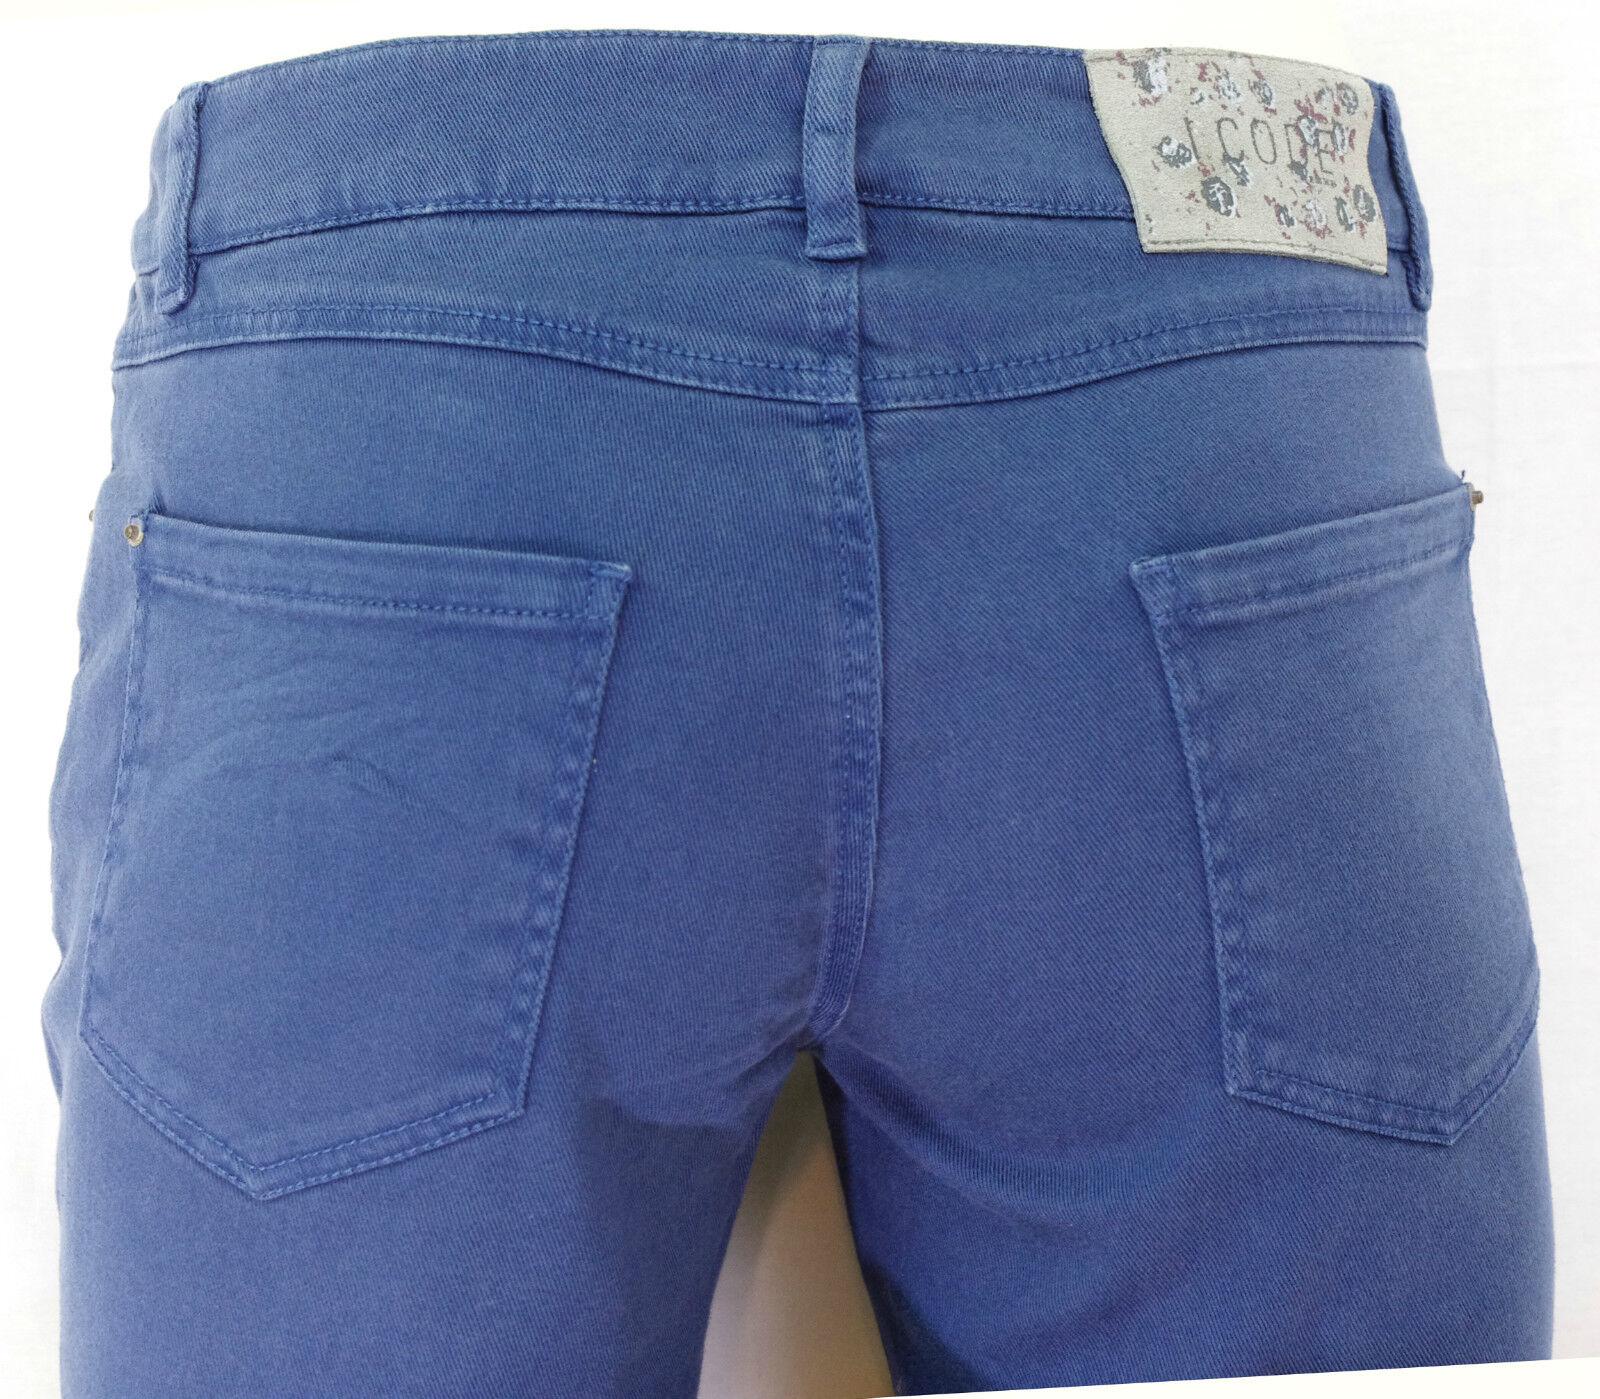 jeans slim fit beige I.CODE by IKKS femme taille semi haute